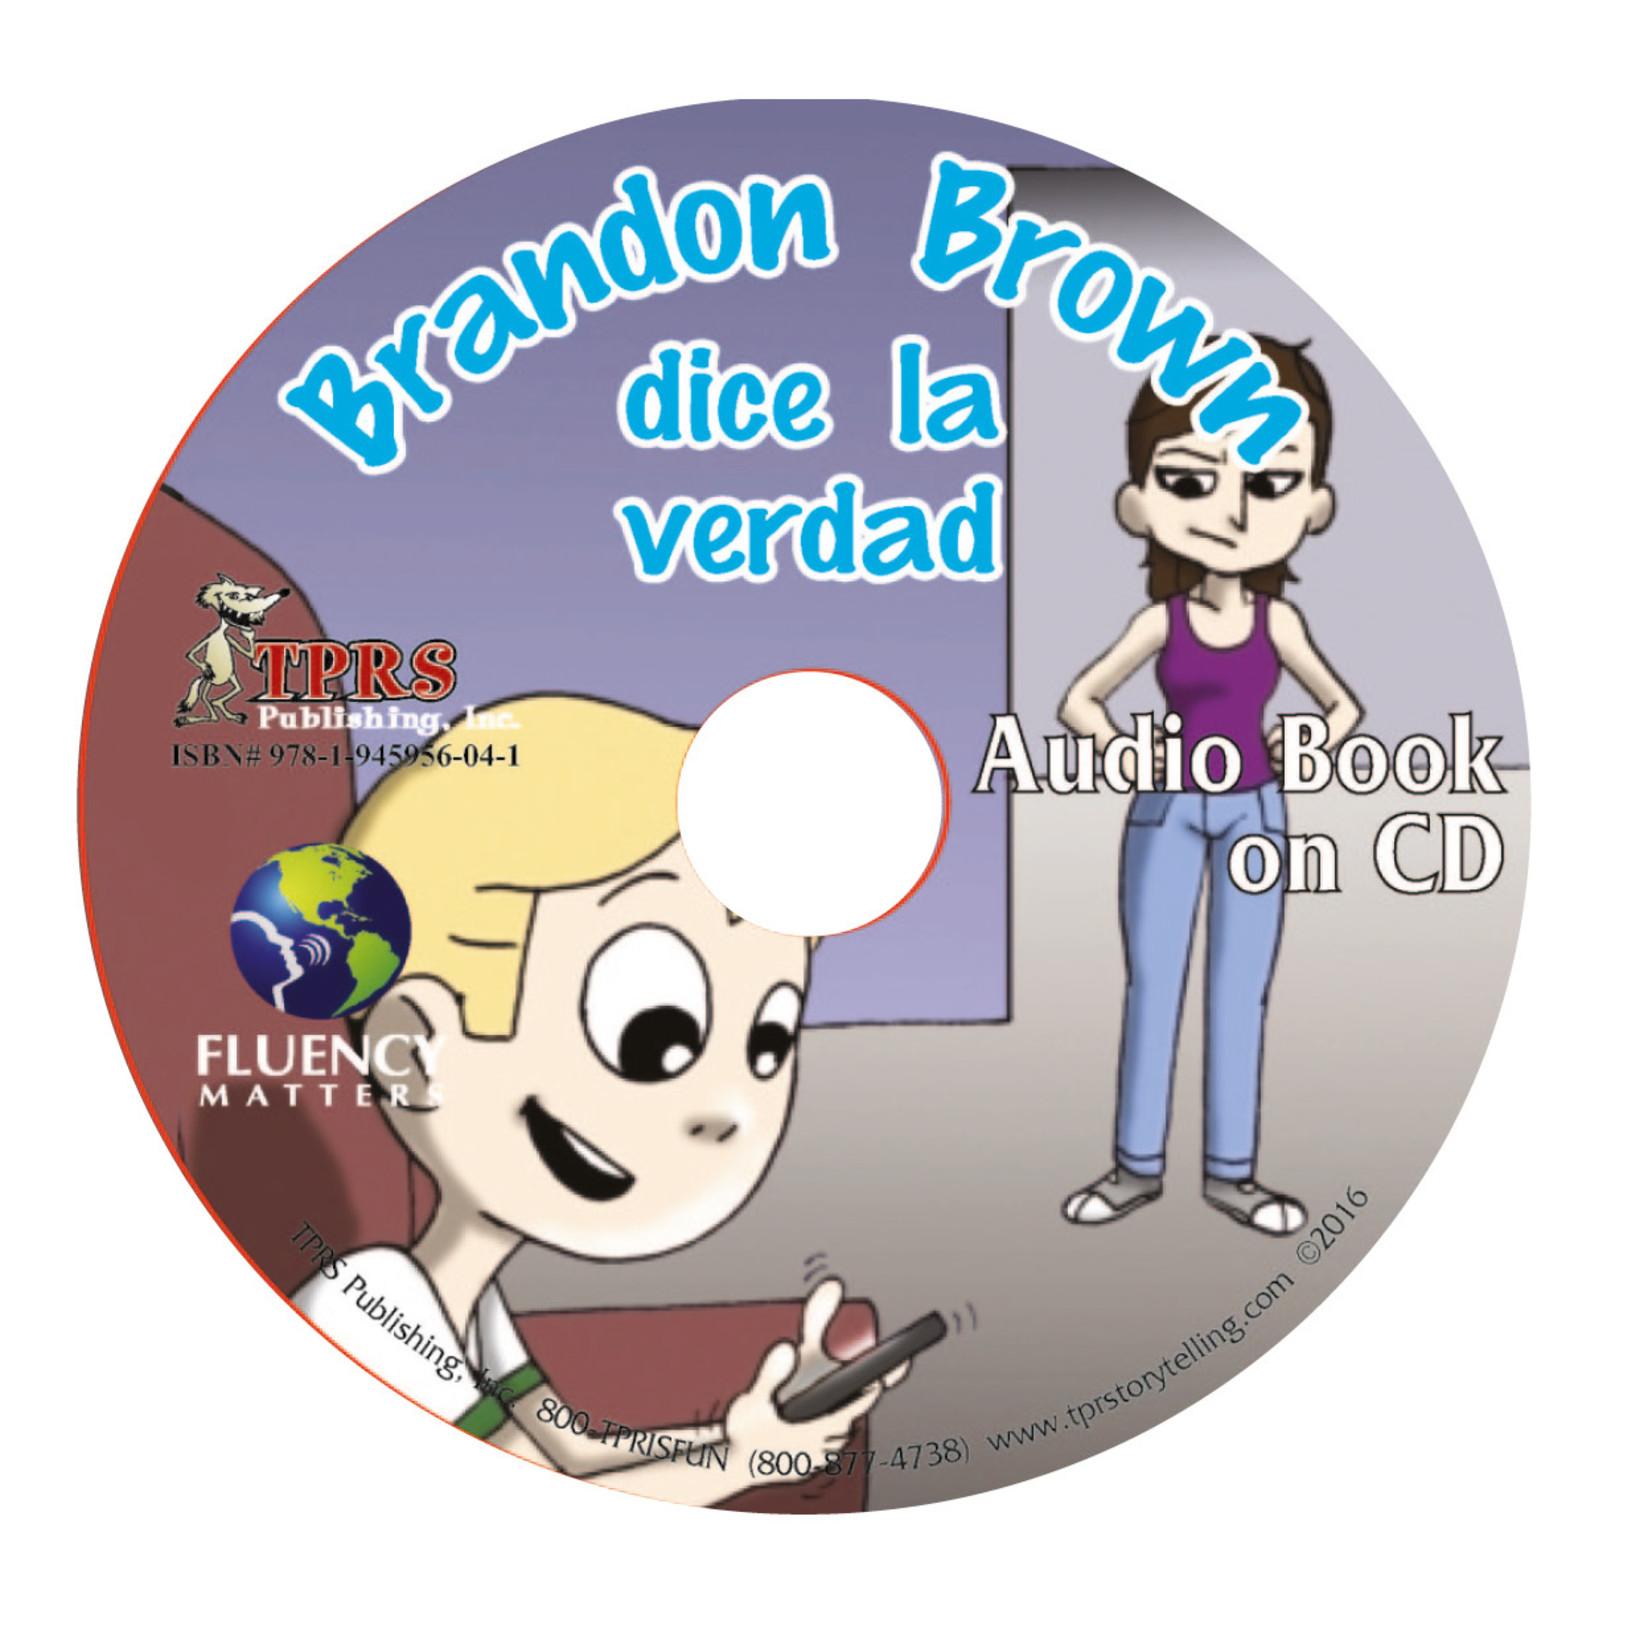 Fluency Matters Brandon Brown dice la verdad - Audio Book